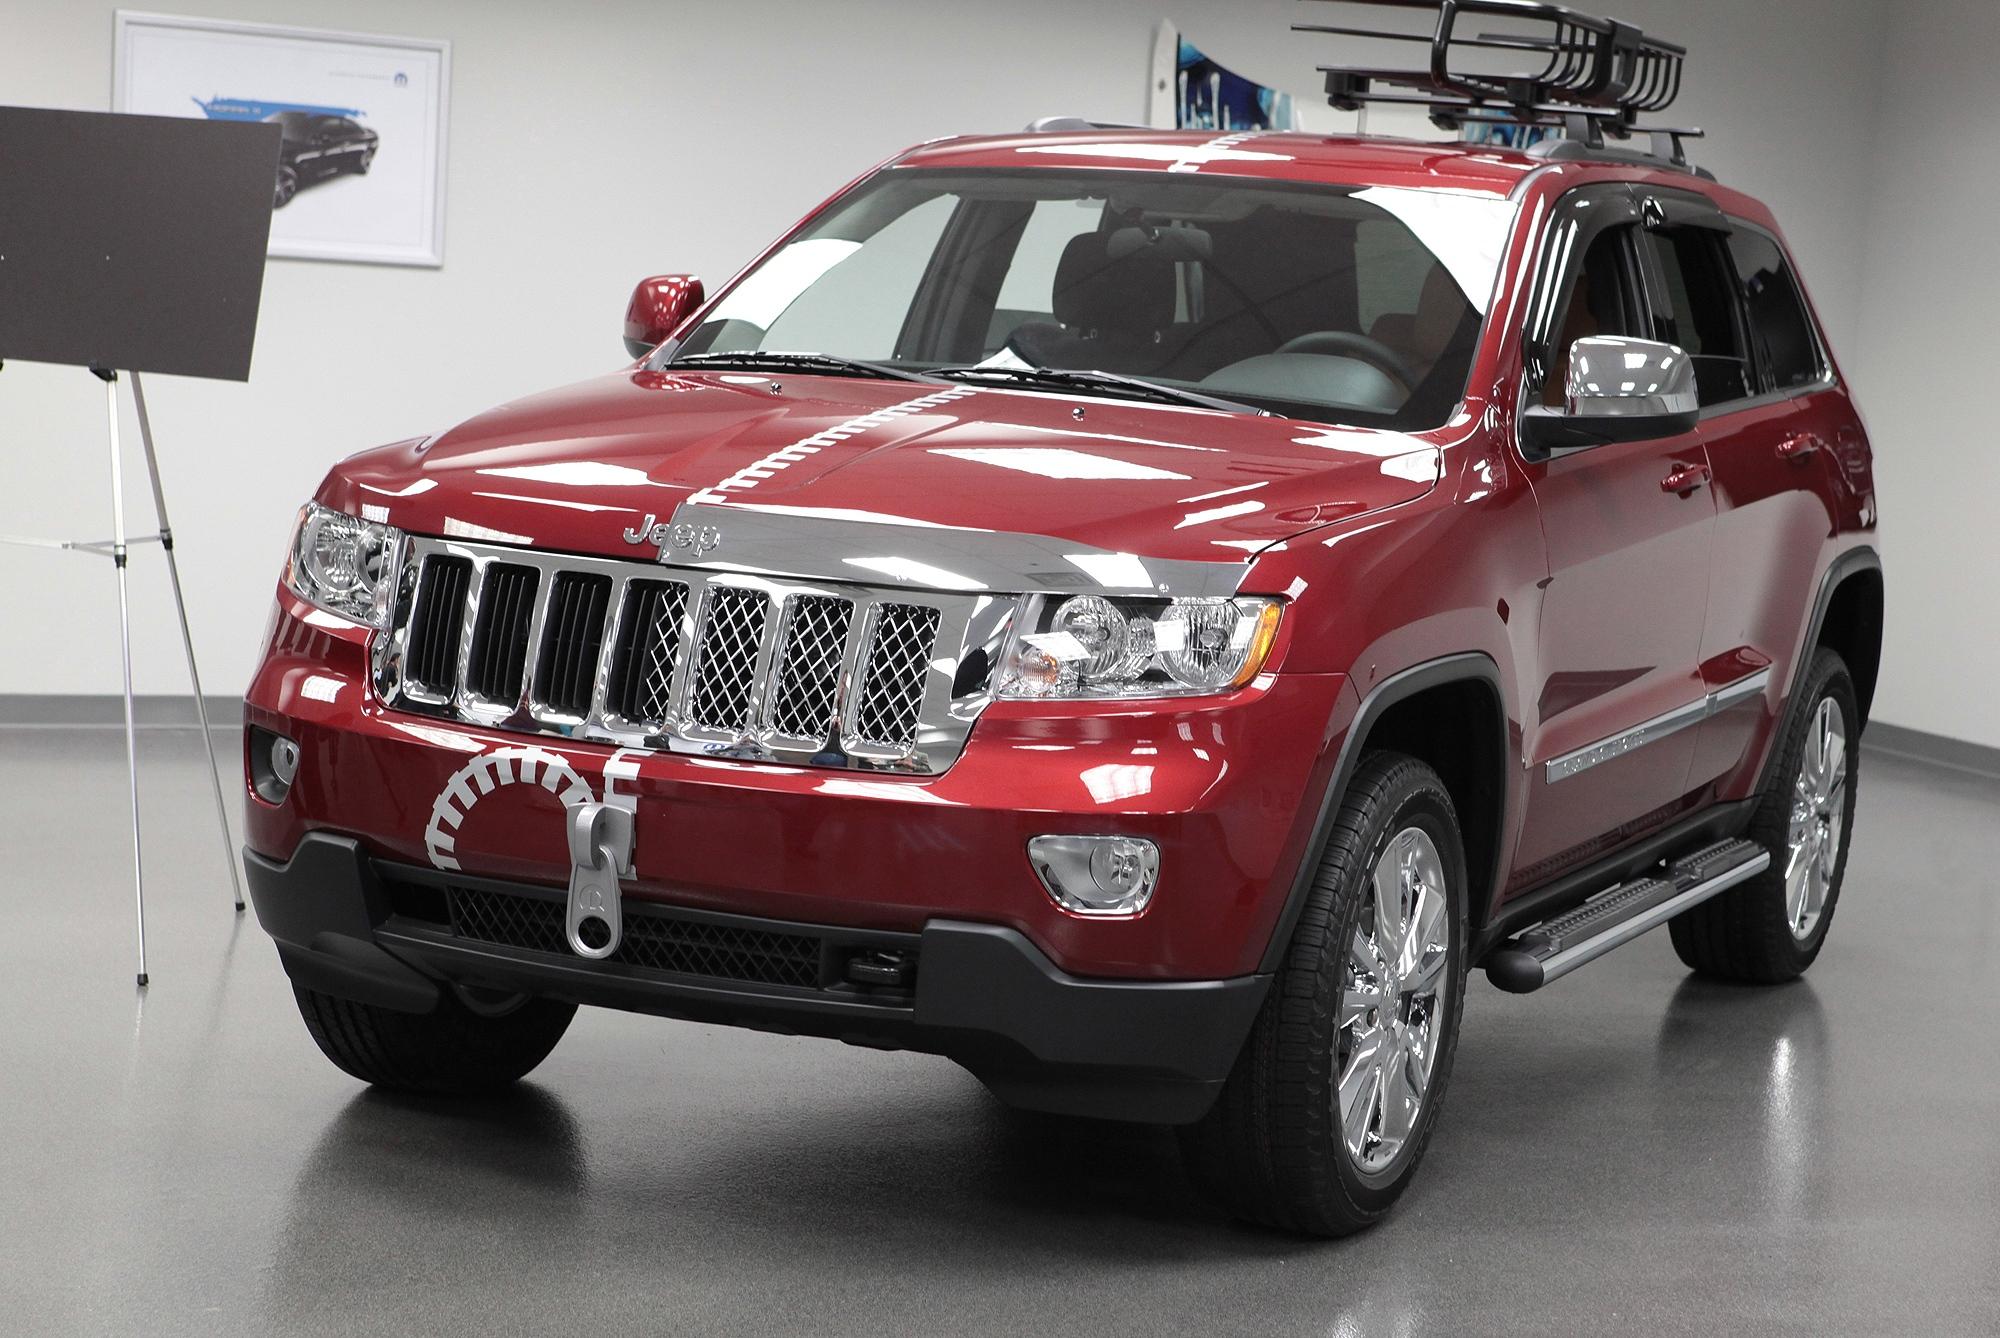 Chrysler_SEMA_2012_8